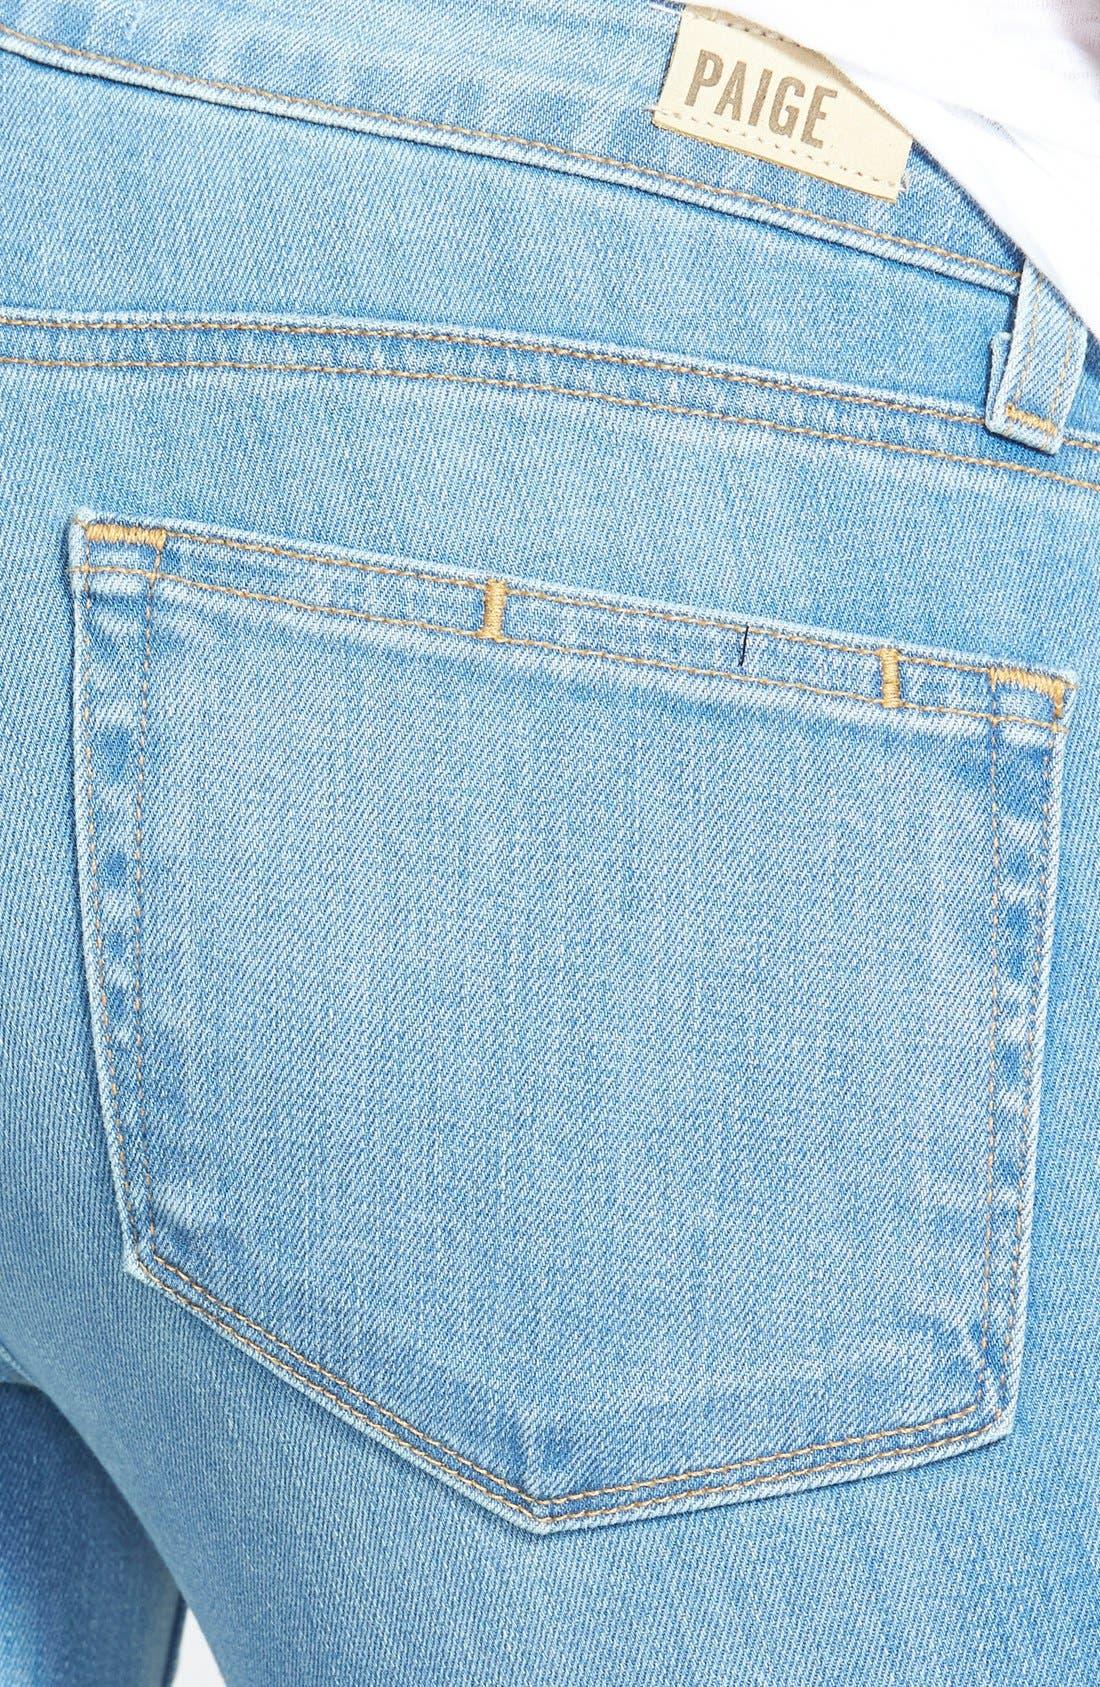 Alternate Image 3  - Paige Denim 'Verdugo' Ultra Skinny Jeans (Maddie)